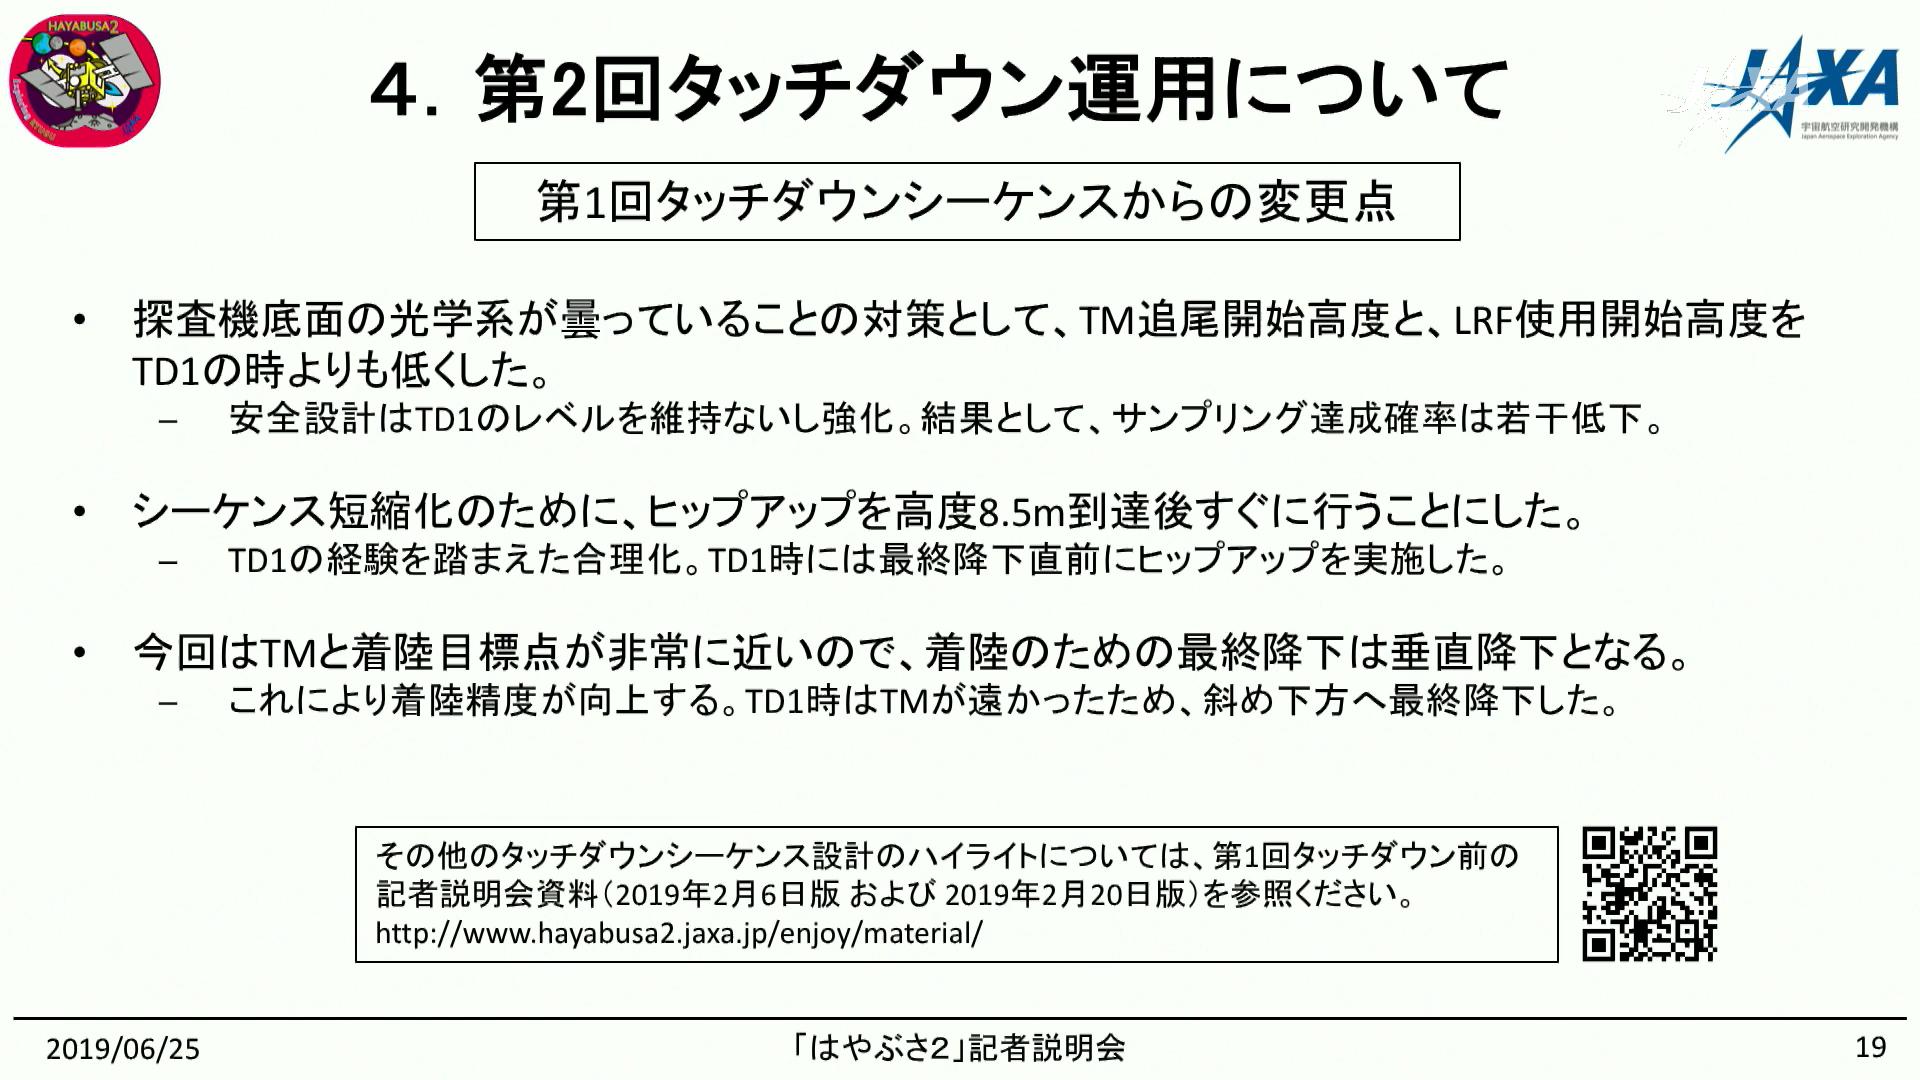 f:id:Imamura:20190625234834p:plain